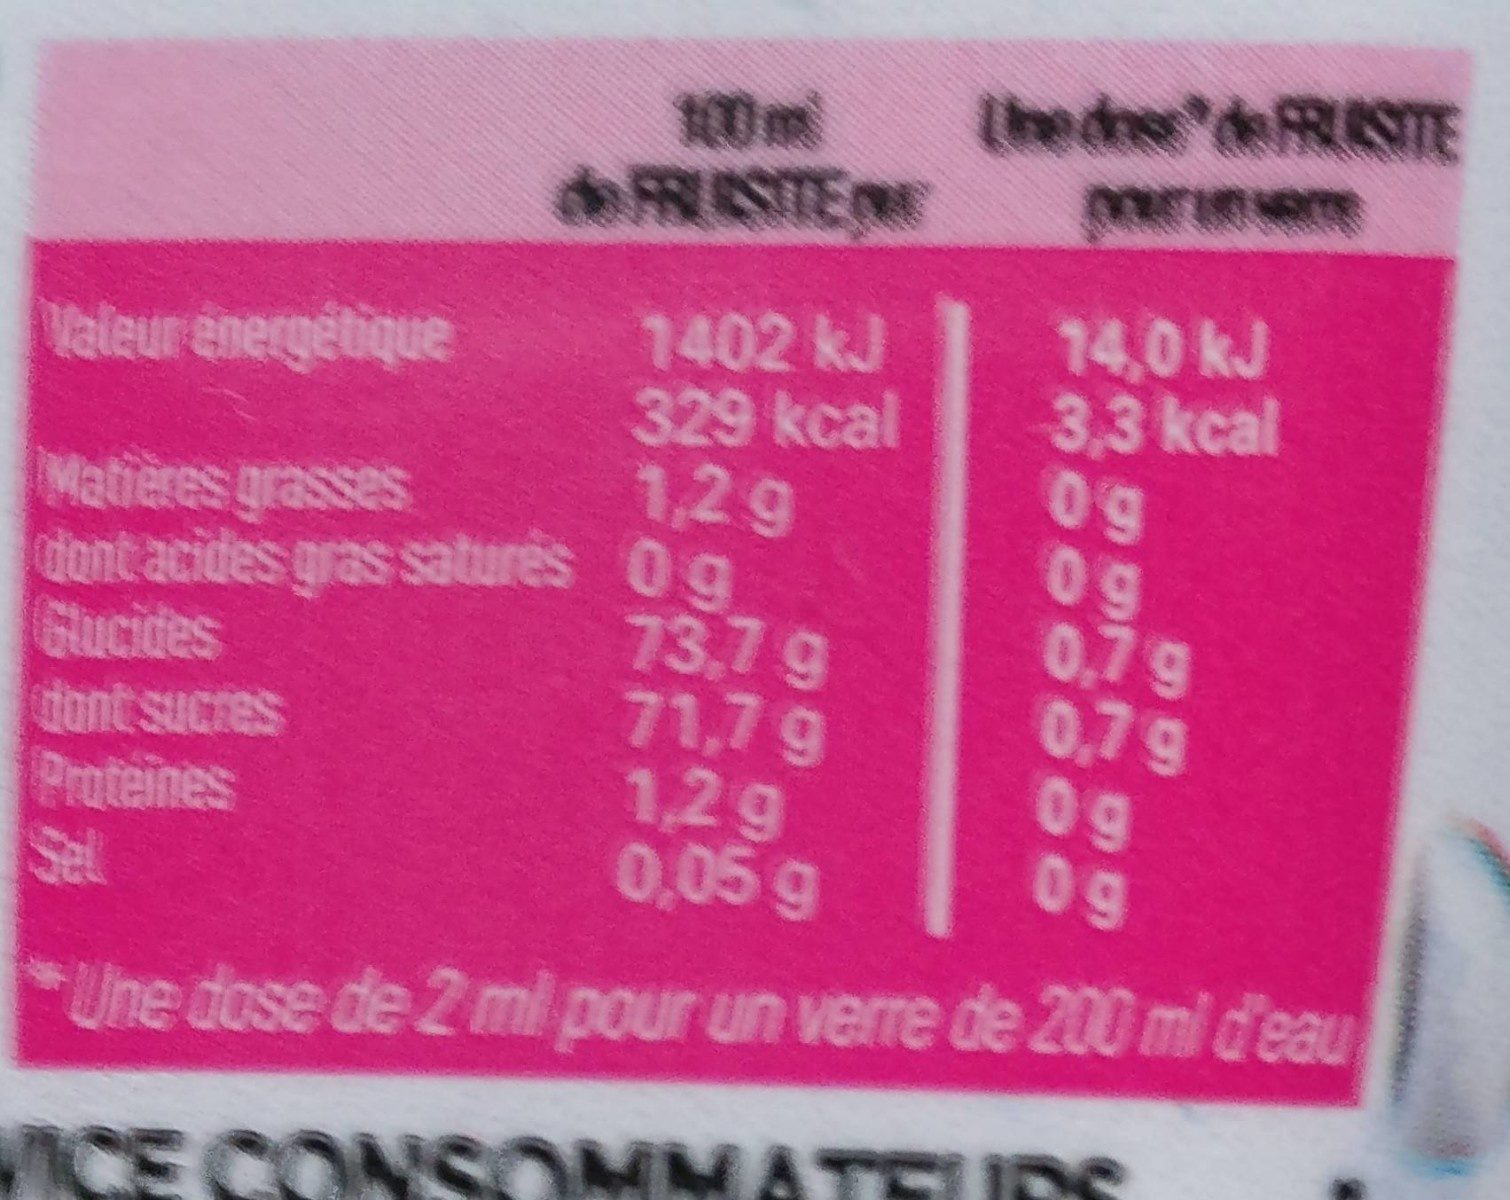 Fruisite Framboise Grenade - Informations nutritionnelles